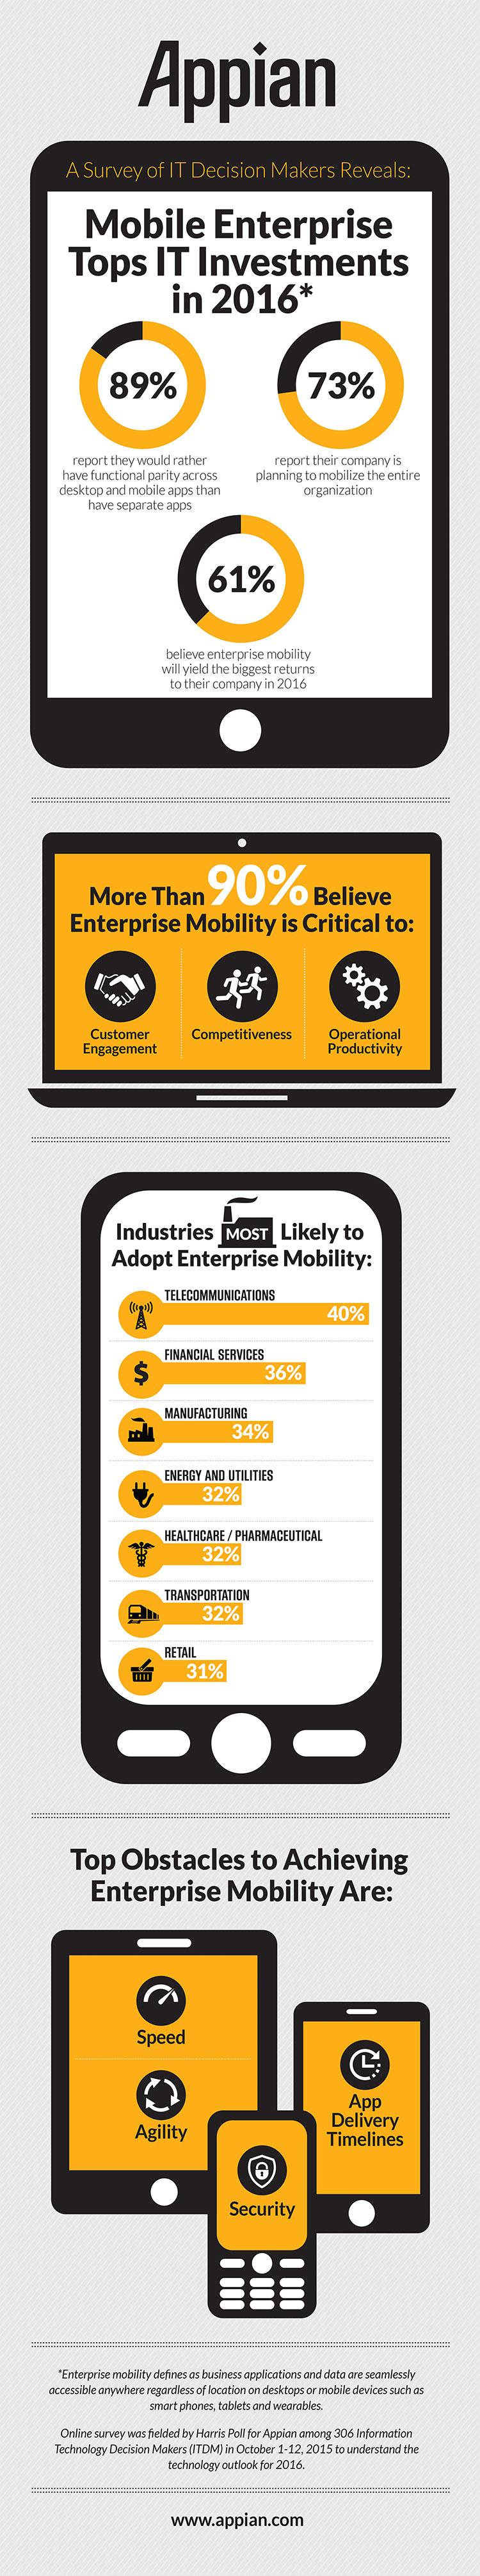 appian_mobility_survey_infographic